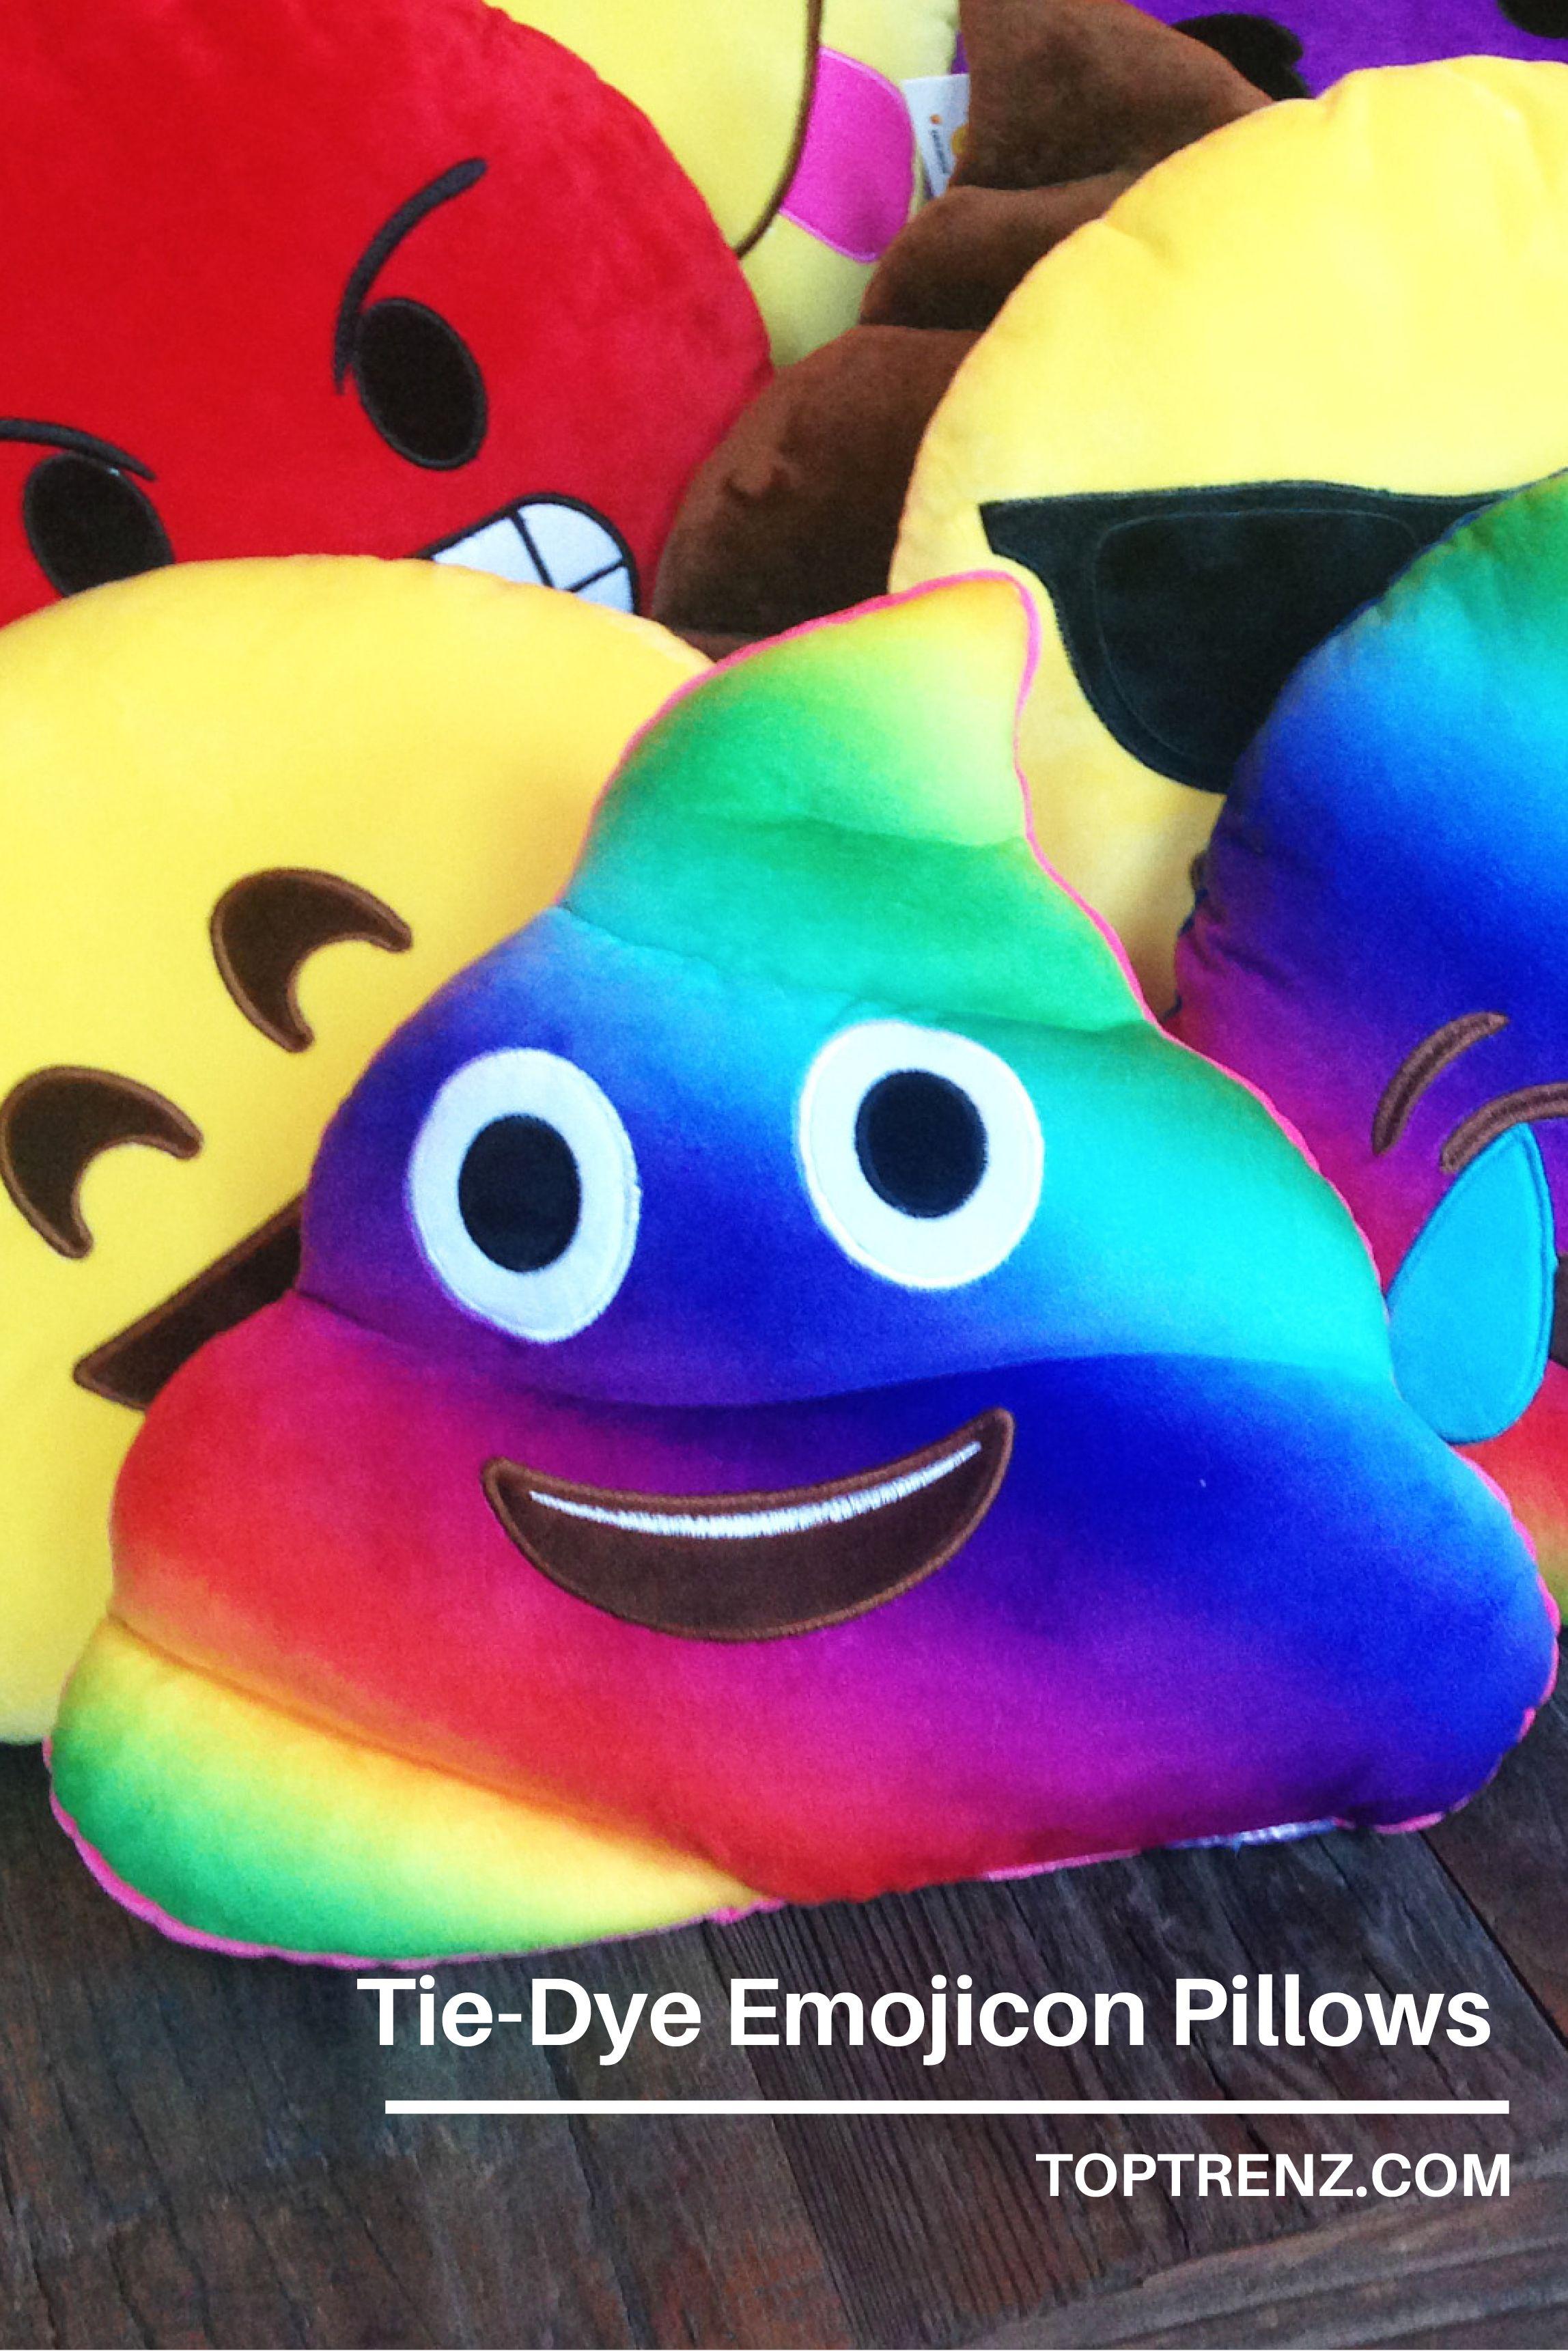 Tie-Dye #emoji pillows in lots of new styles.